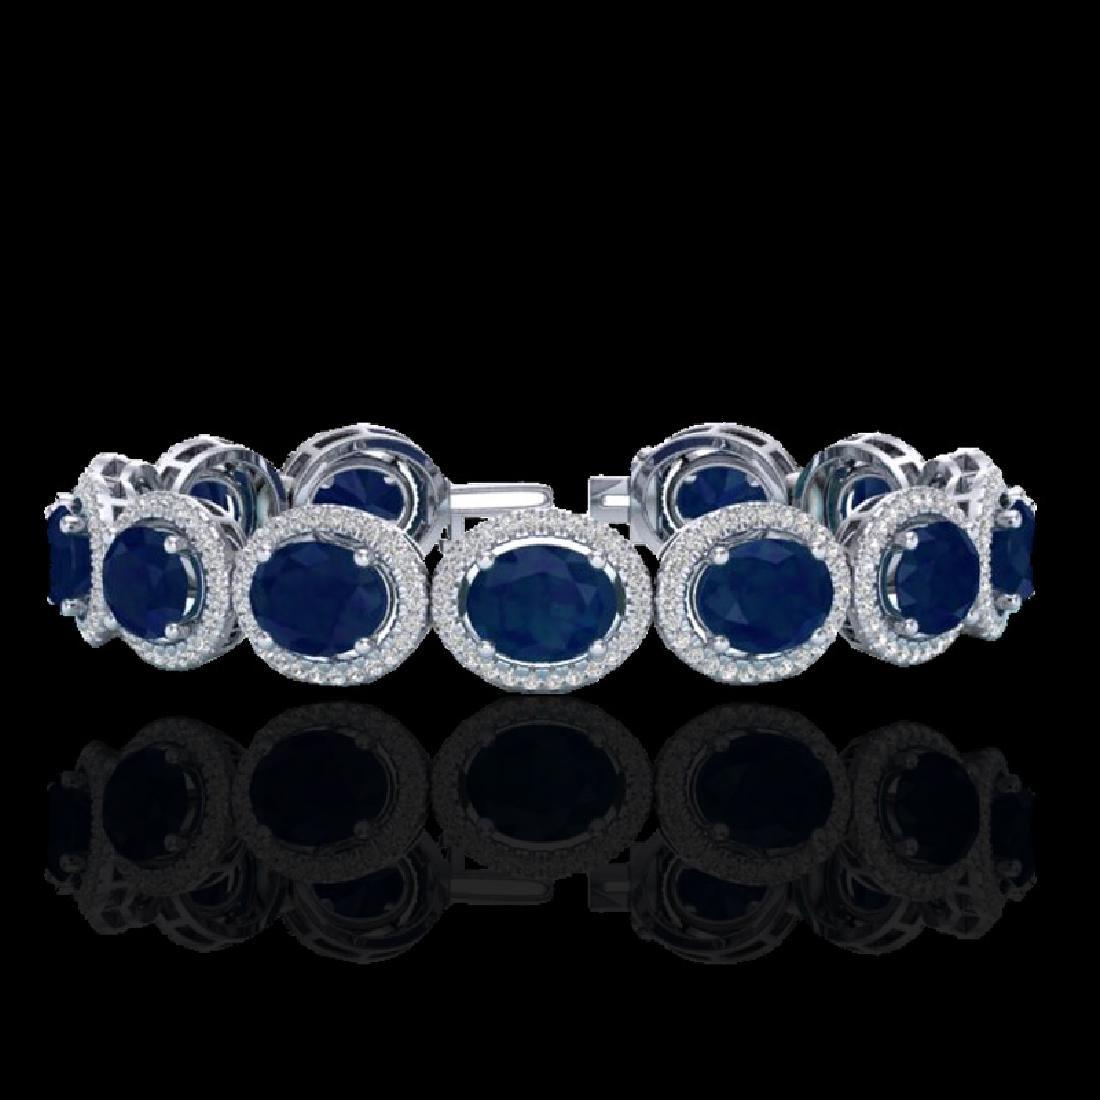 30 CTW Sapphire & Micro Pave VS/SI Diamond Bracelet 10K